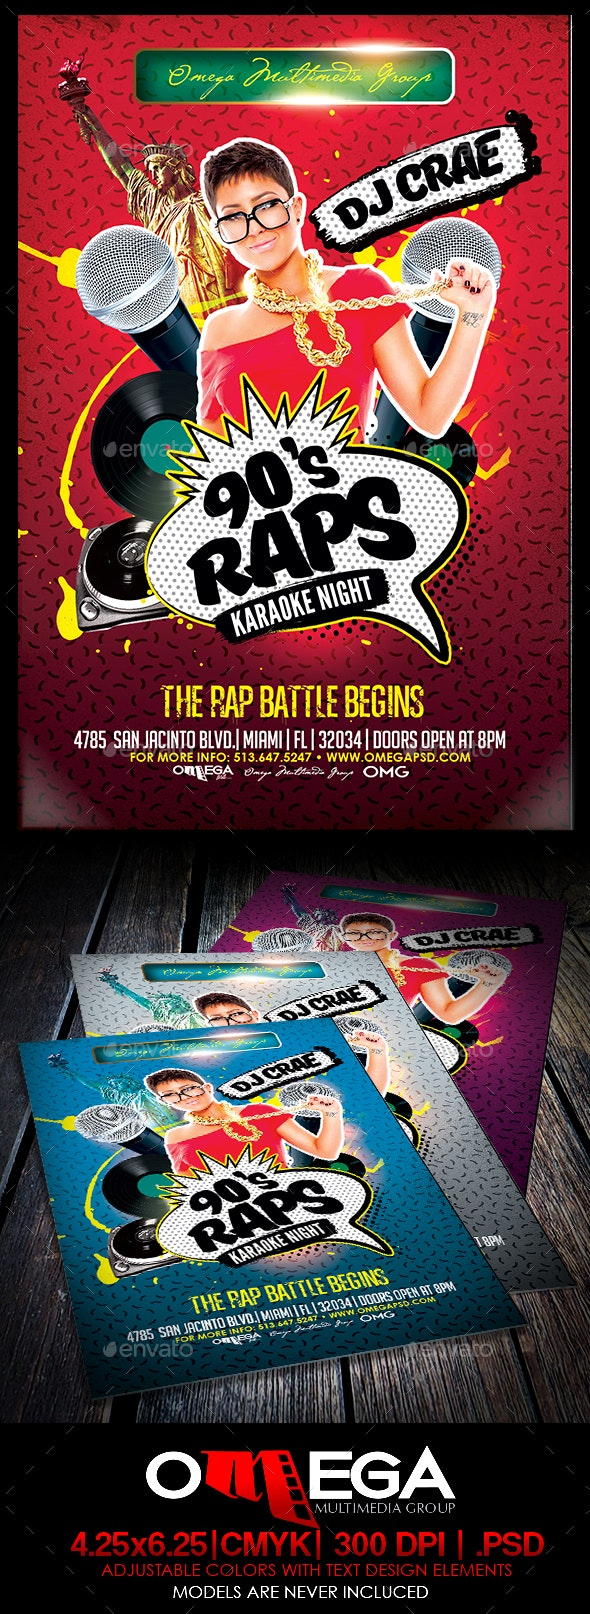 90's Rap Karaoke Night - Flyers Print Templates